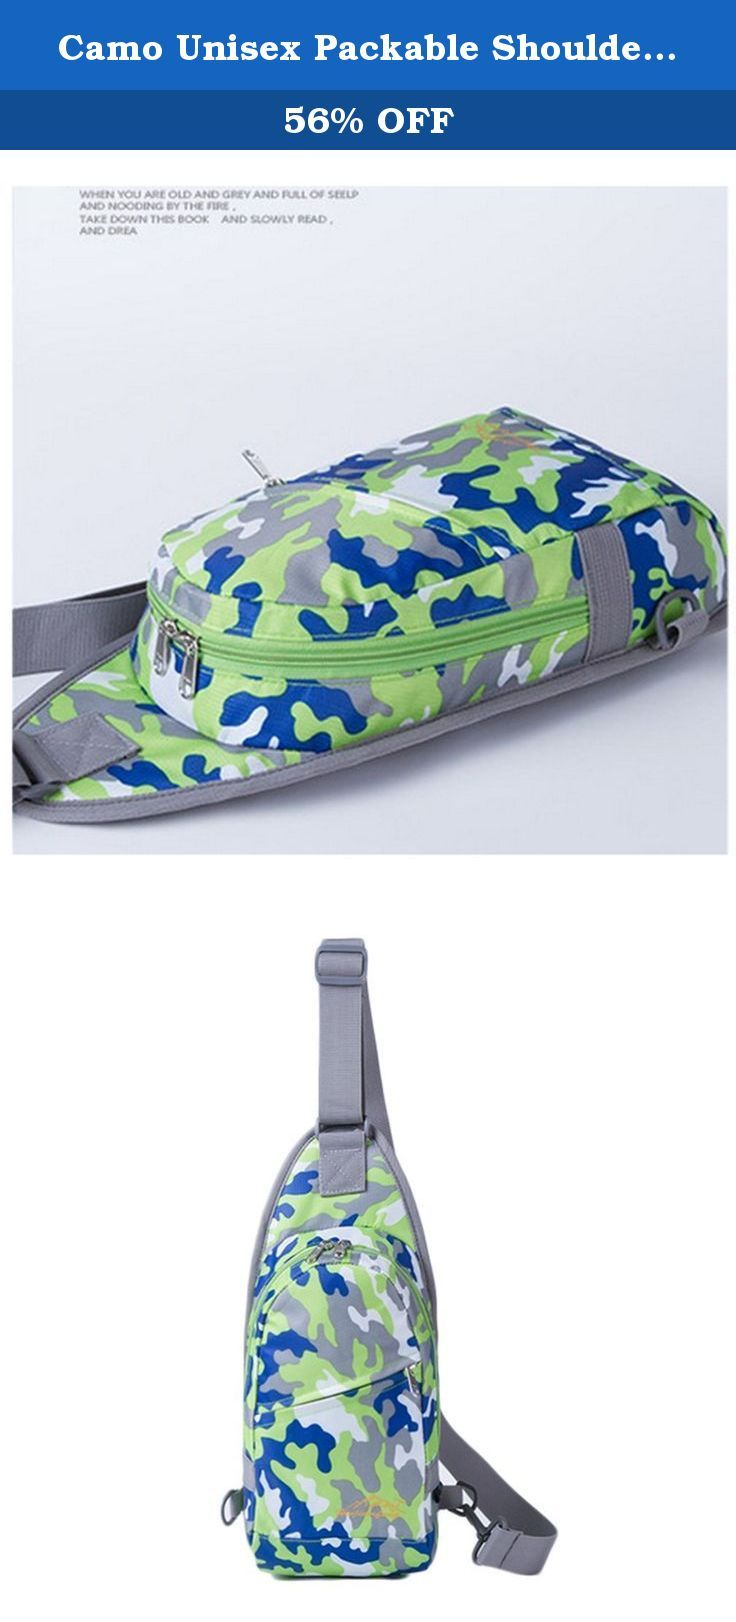 Camo Unisex Packable Shoulder Backpack Sling Chest Sport Hiking Bag Cover Bicycle Cross Body Bag Rucksack Travel Backpack Camping Bag Bookbag. ★Fashion Joker Camo Shoulder Sling Unbalance Backpack Satchel Outdoor Travel Bike ★Specifications: 1.Style: Fashion/Casual/Sport 2.Material: water-repellent and tear-resistant Nylon 3.Belt length:70-112cm 5.G???? ?.